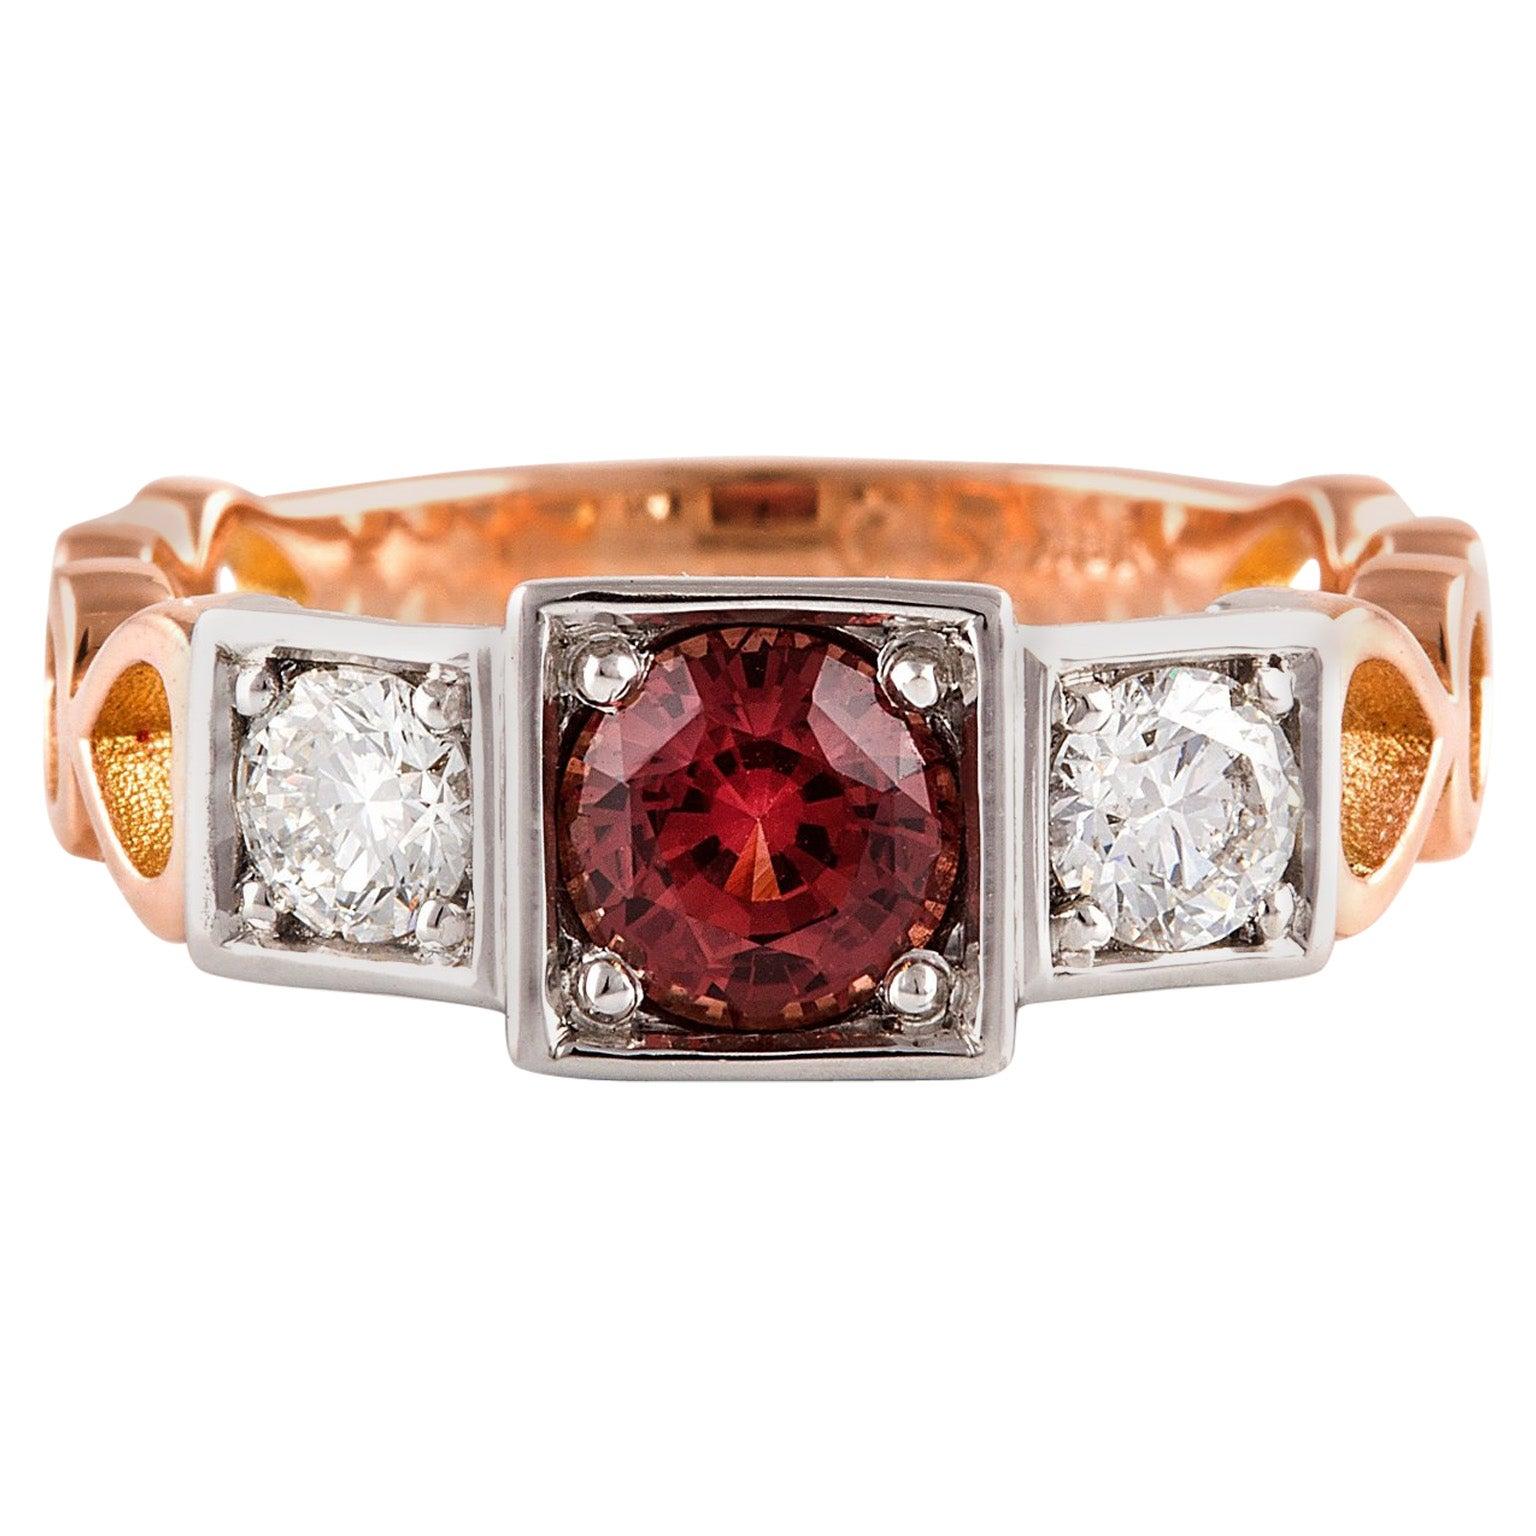 Kian Design, 18 Carat Three Stones Orange Sapphire and Diamond Ring